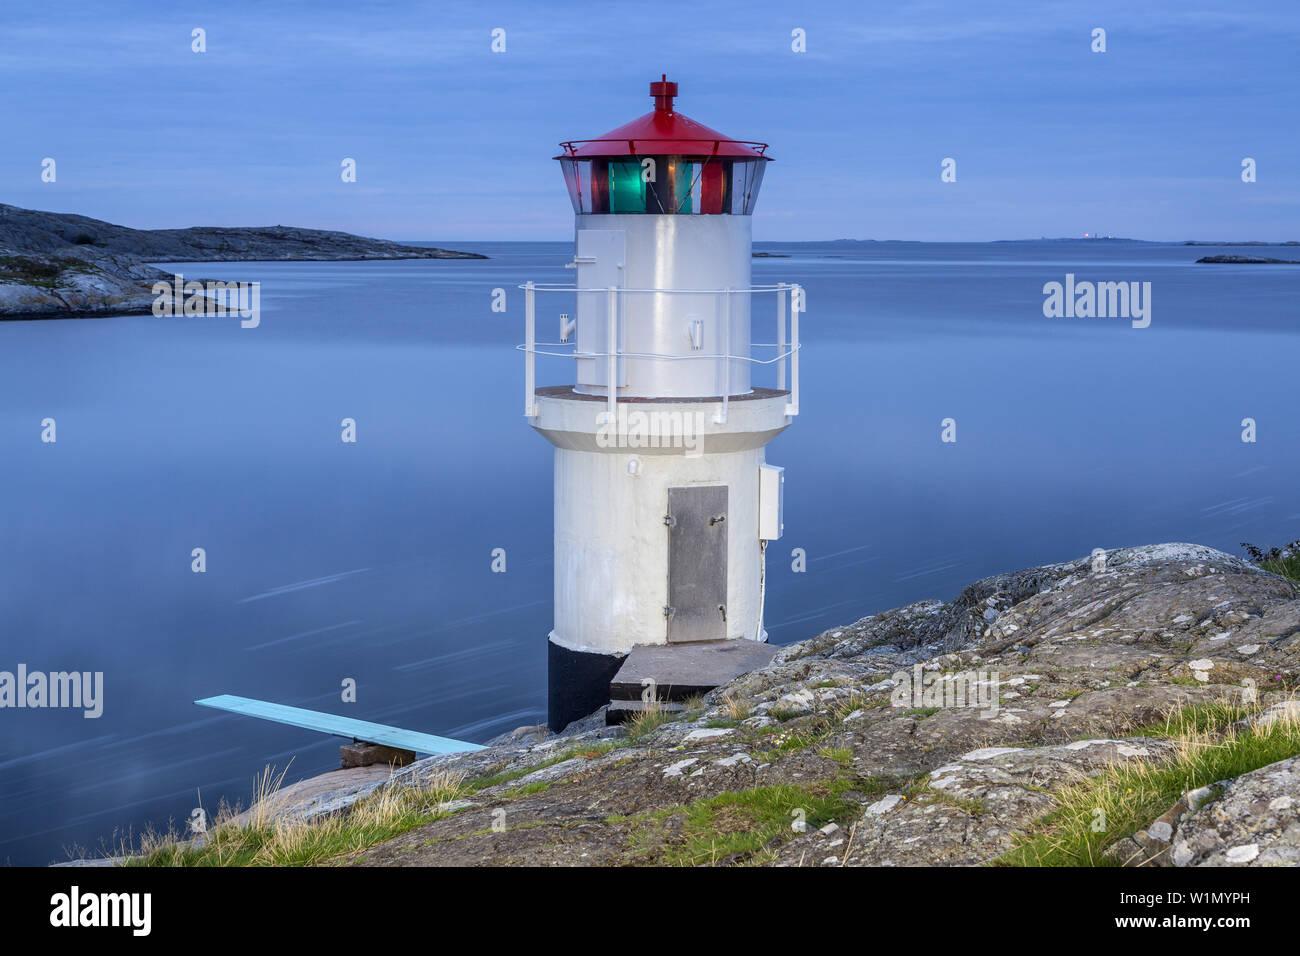 Lighthouse at the coast of the North Sea near Mollösund, Island Orust, Bohuslän, Västergötland, Götaland, South Sweden, Sweden, Scandinavia, Northern - Stock Image